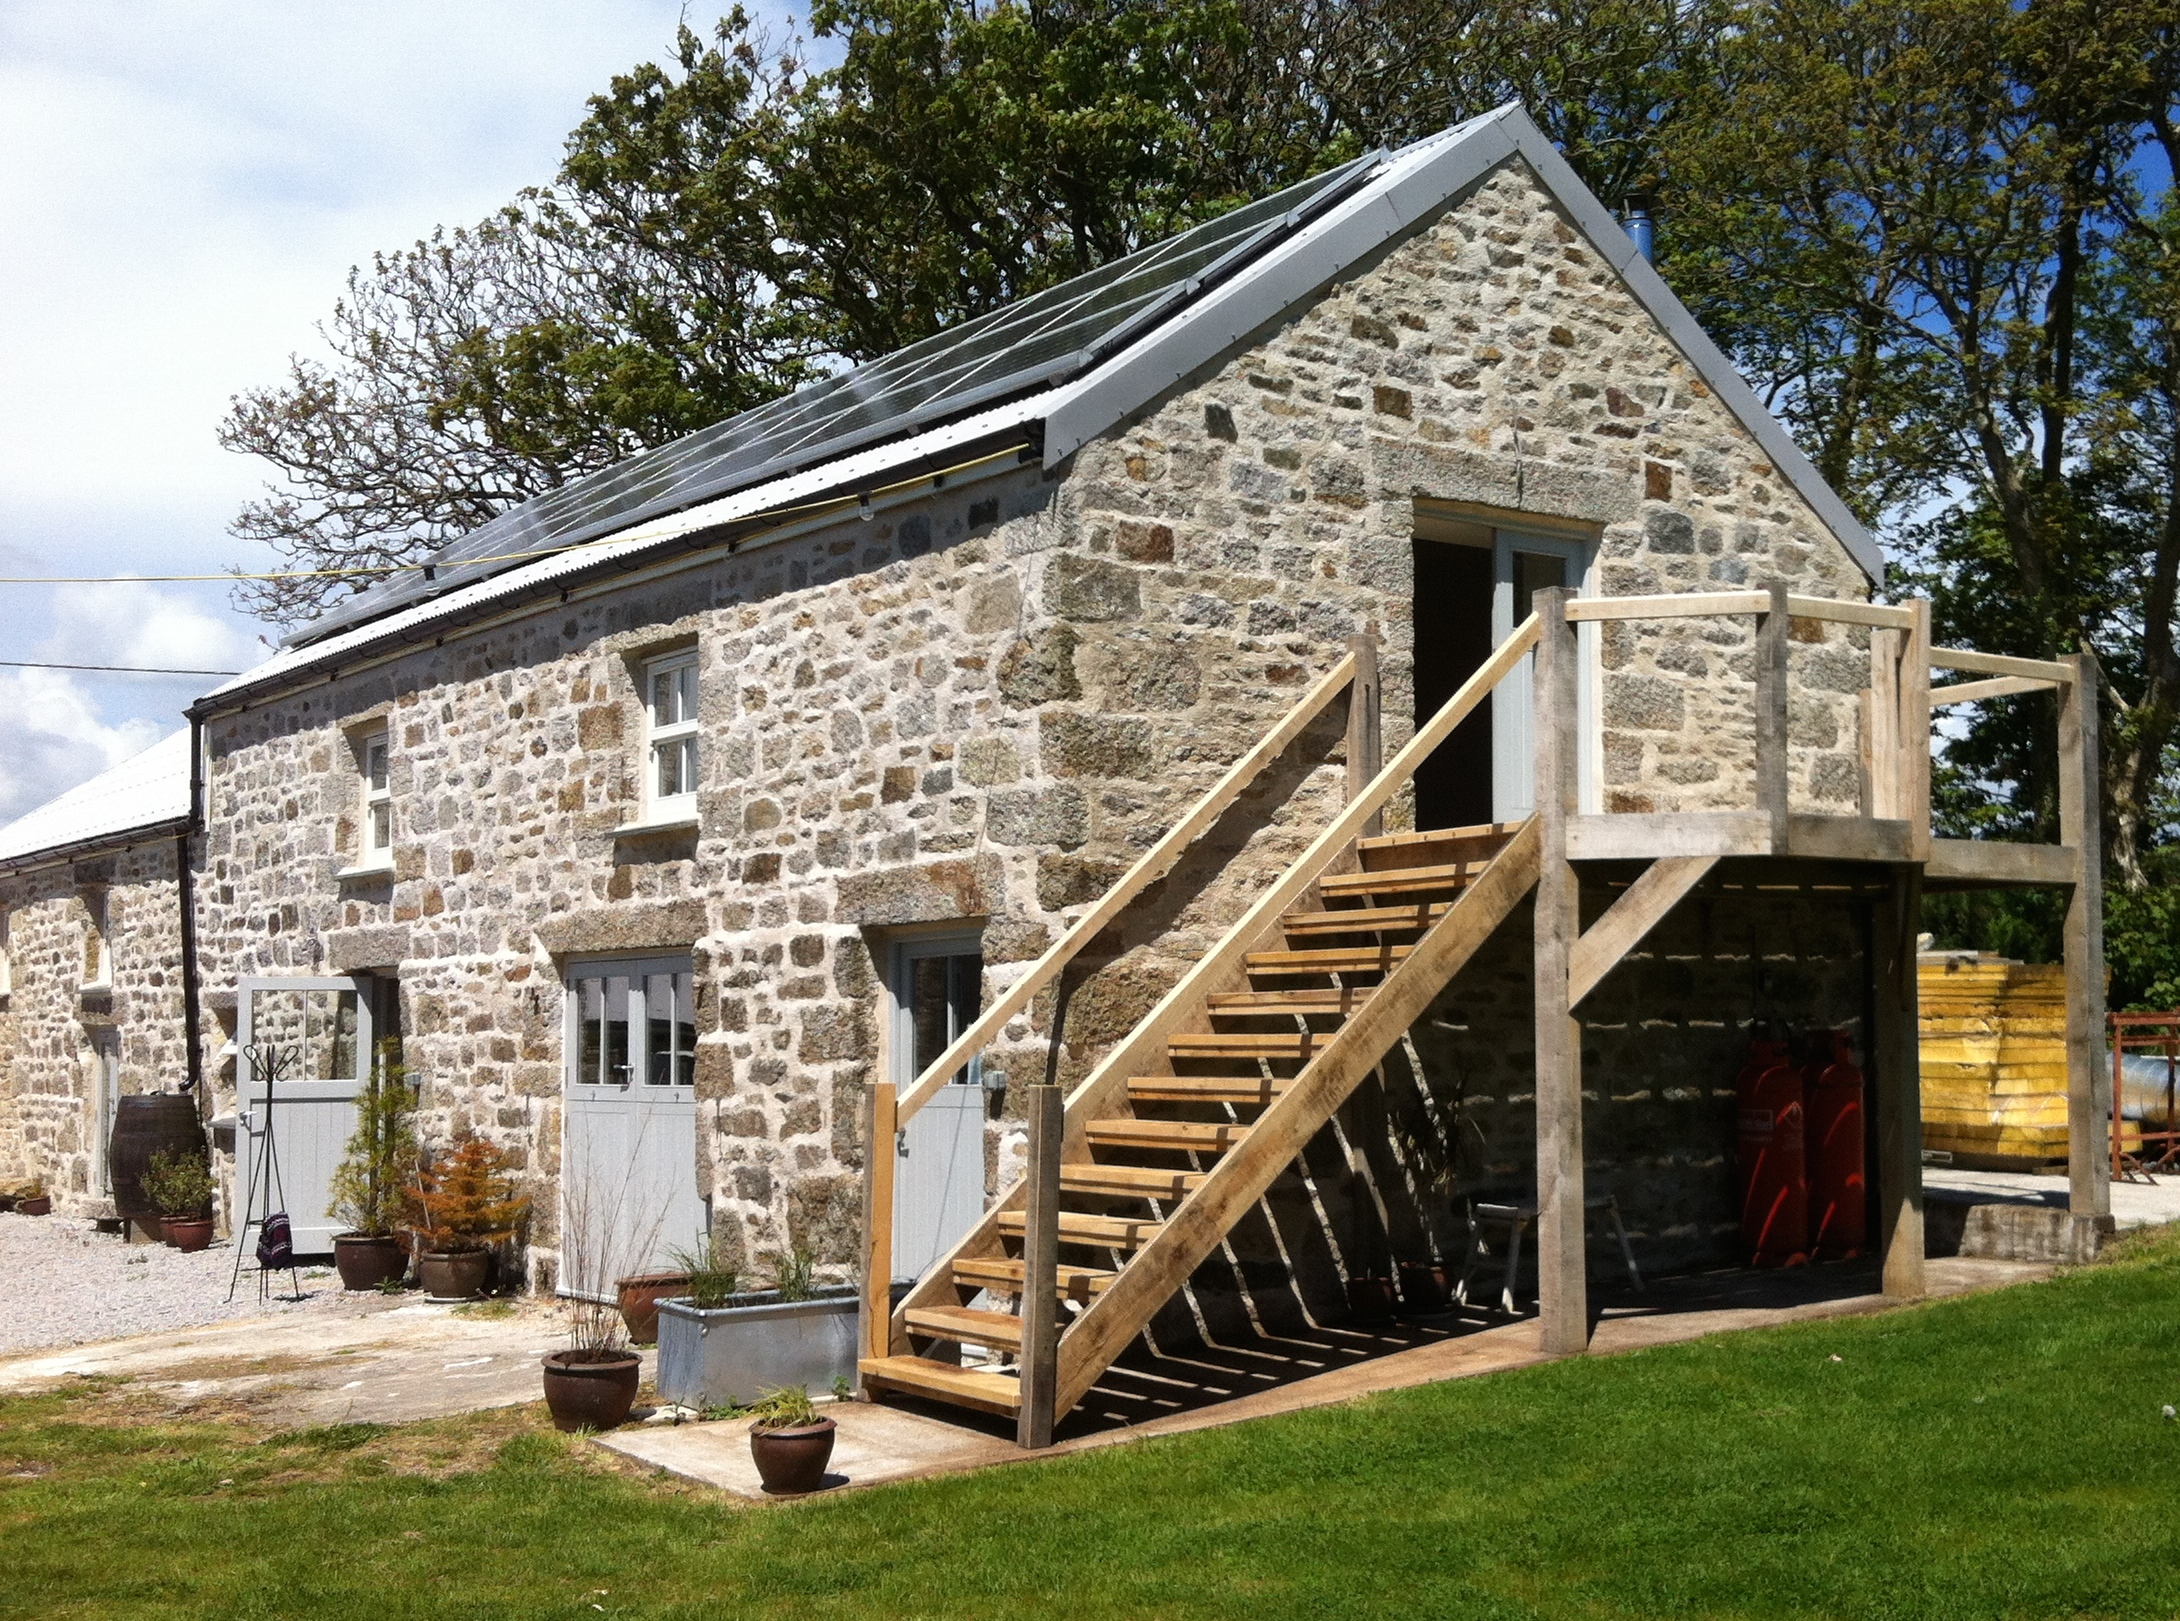 The Long Barn and Hayloft